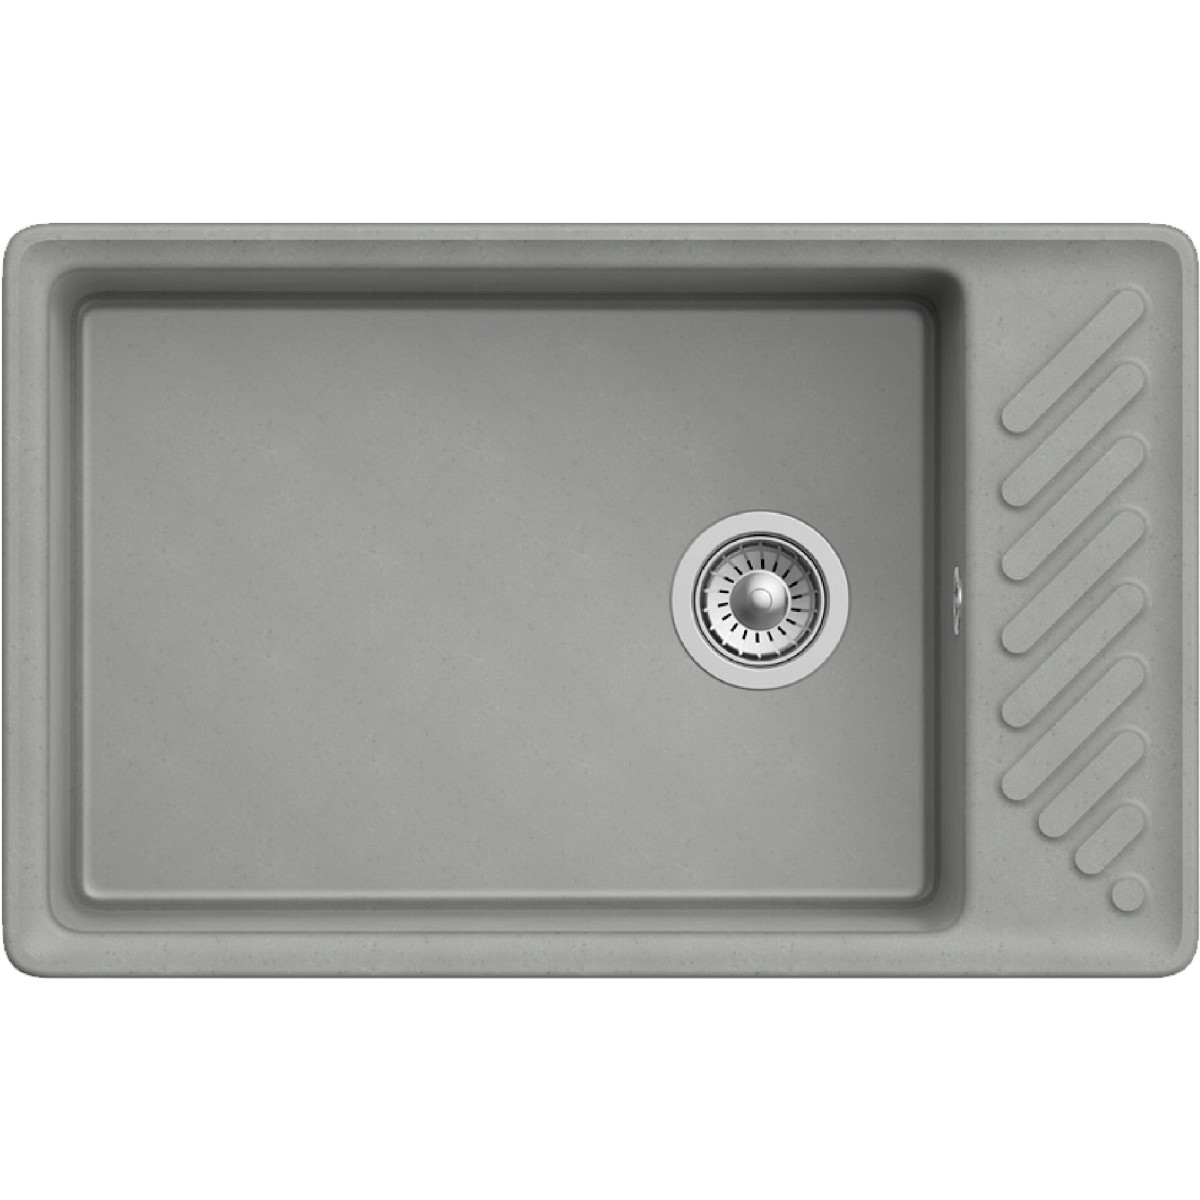 Кухонная мойка GranFest Z 51 QUARZ51 серый